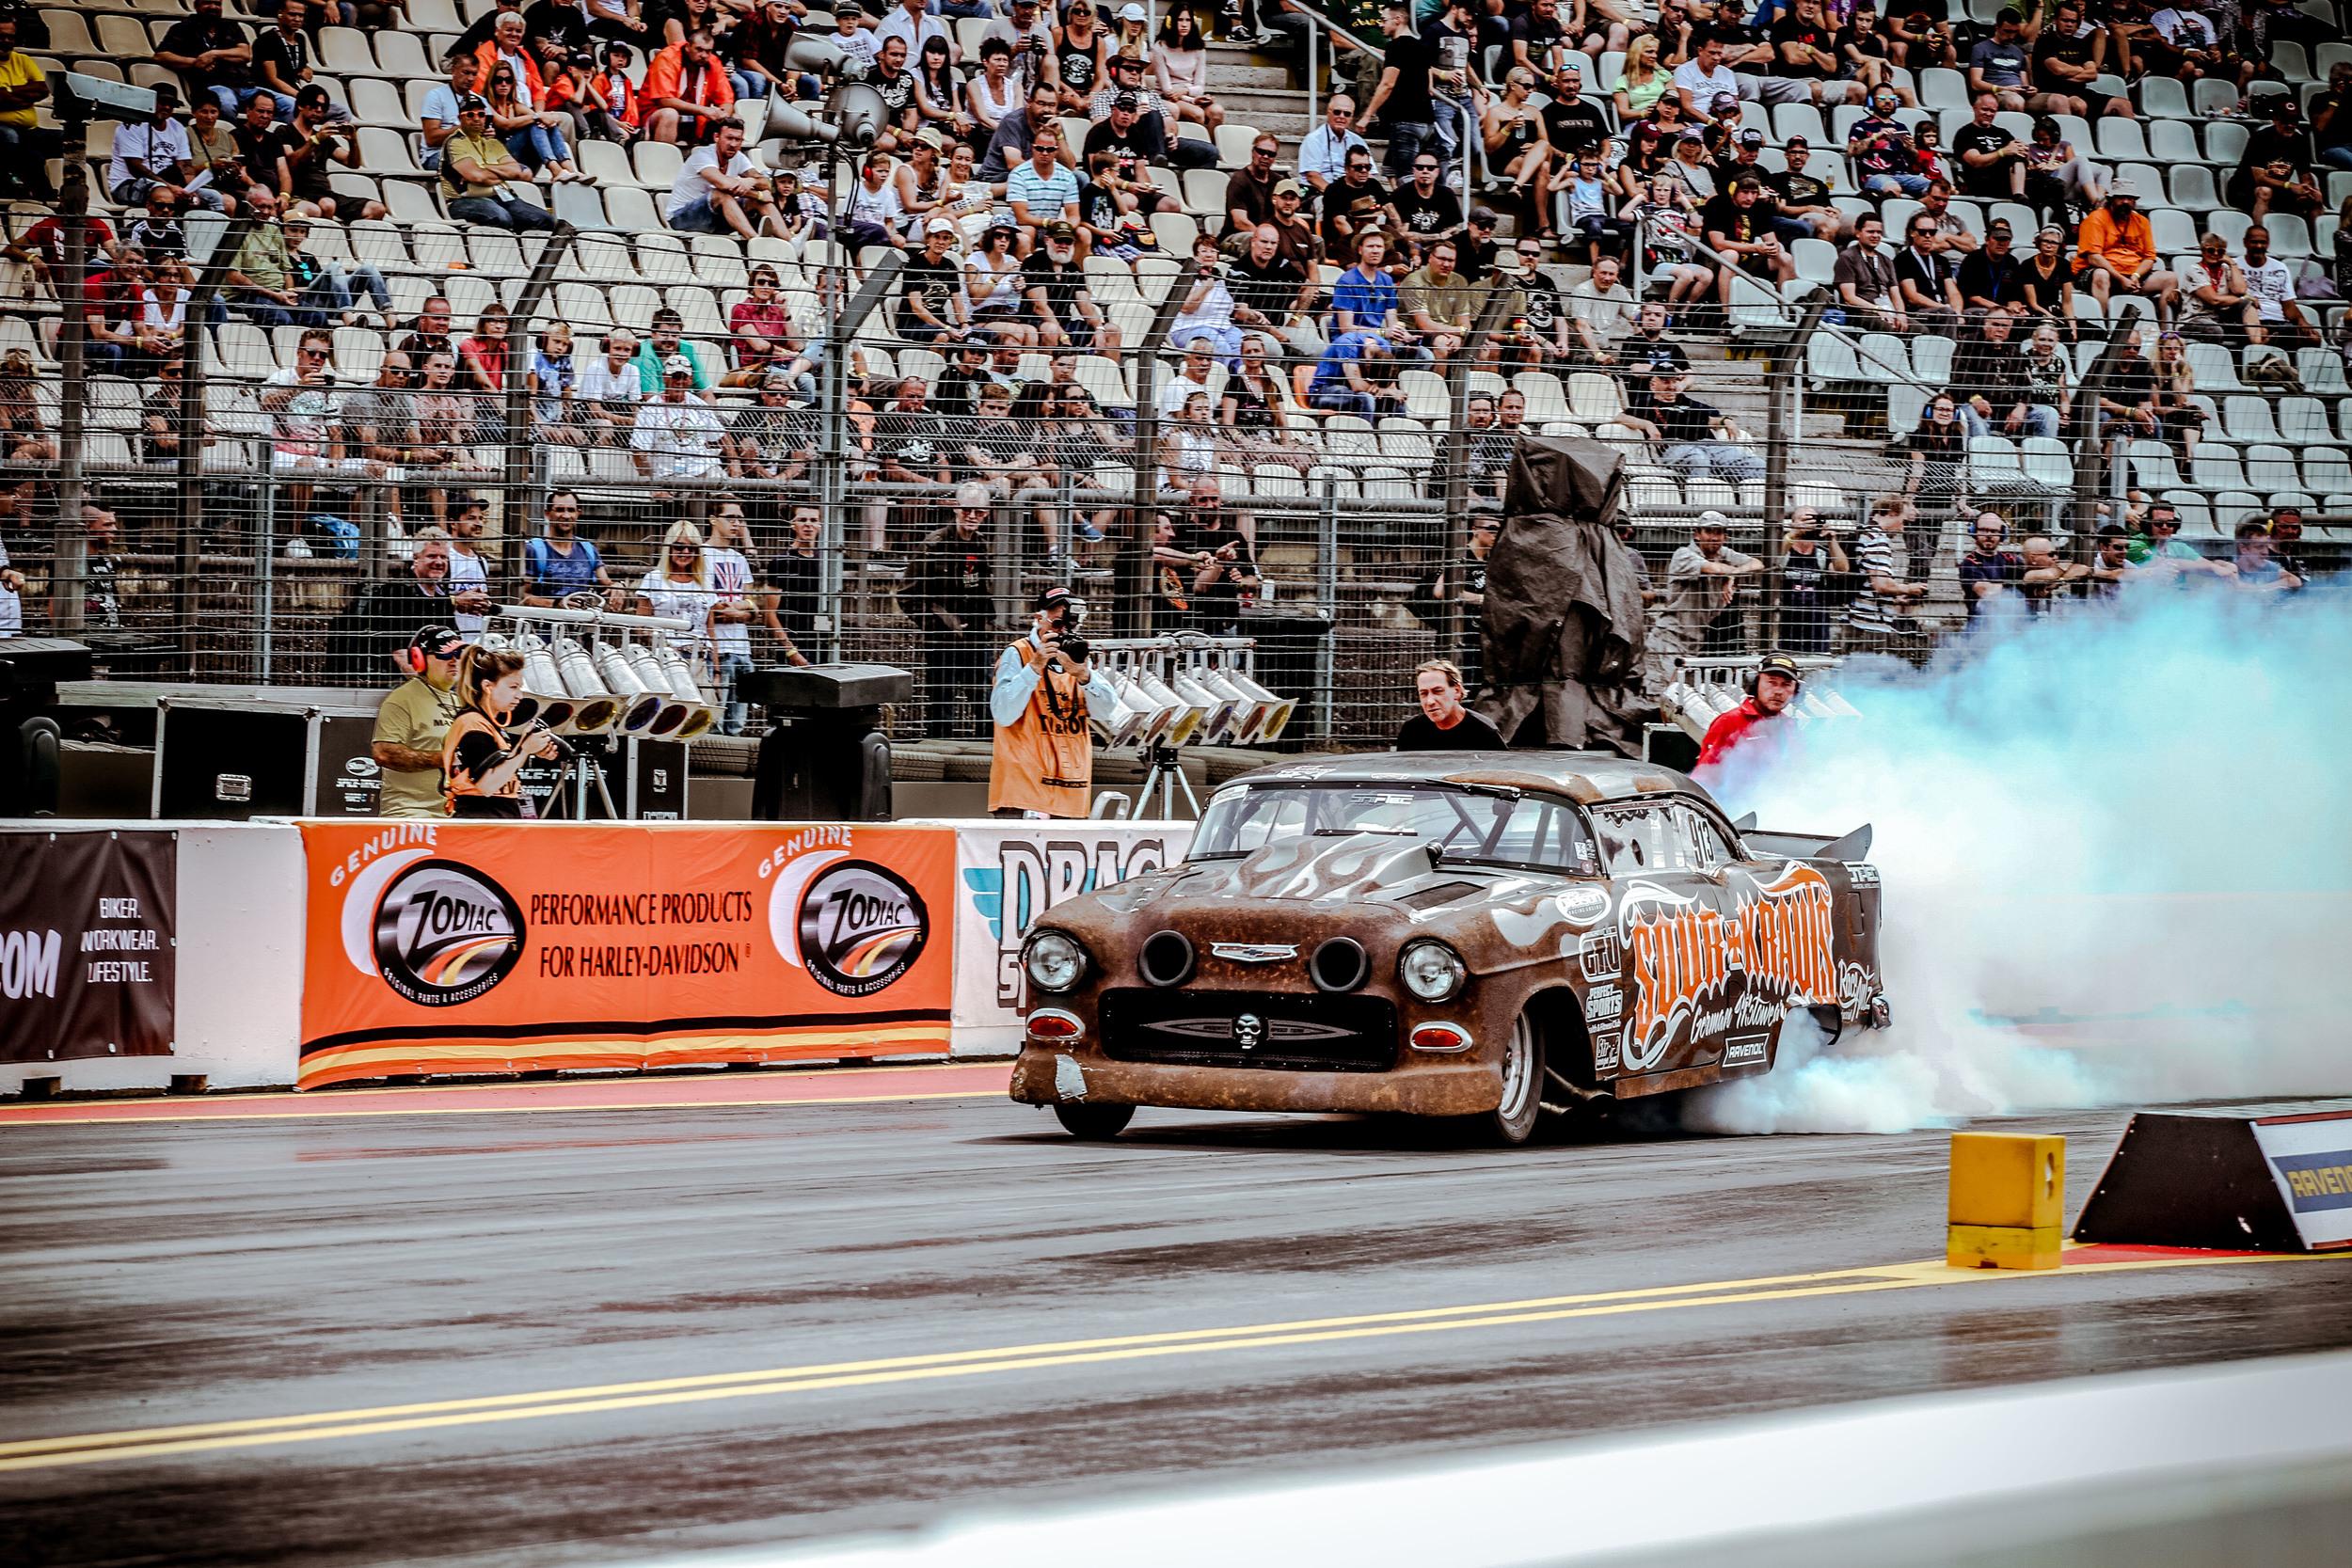 Race Antz NitrolympX 2016 by Dirk Behlau-2037.jpg